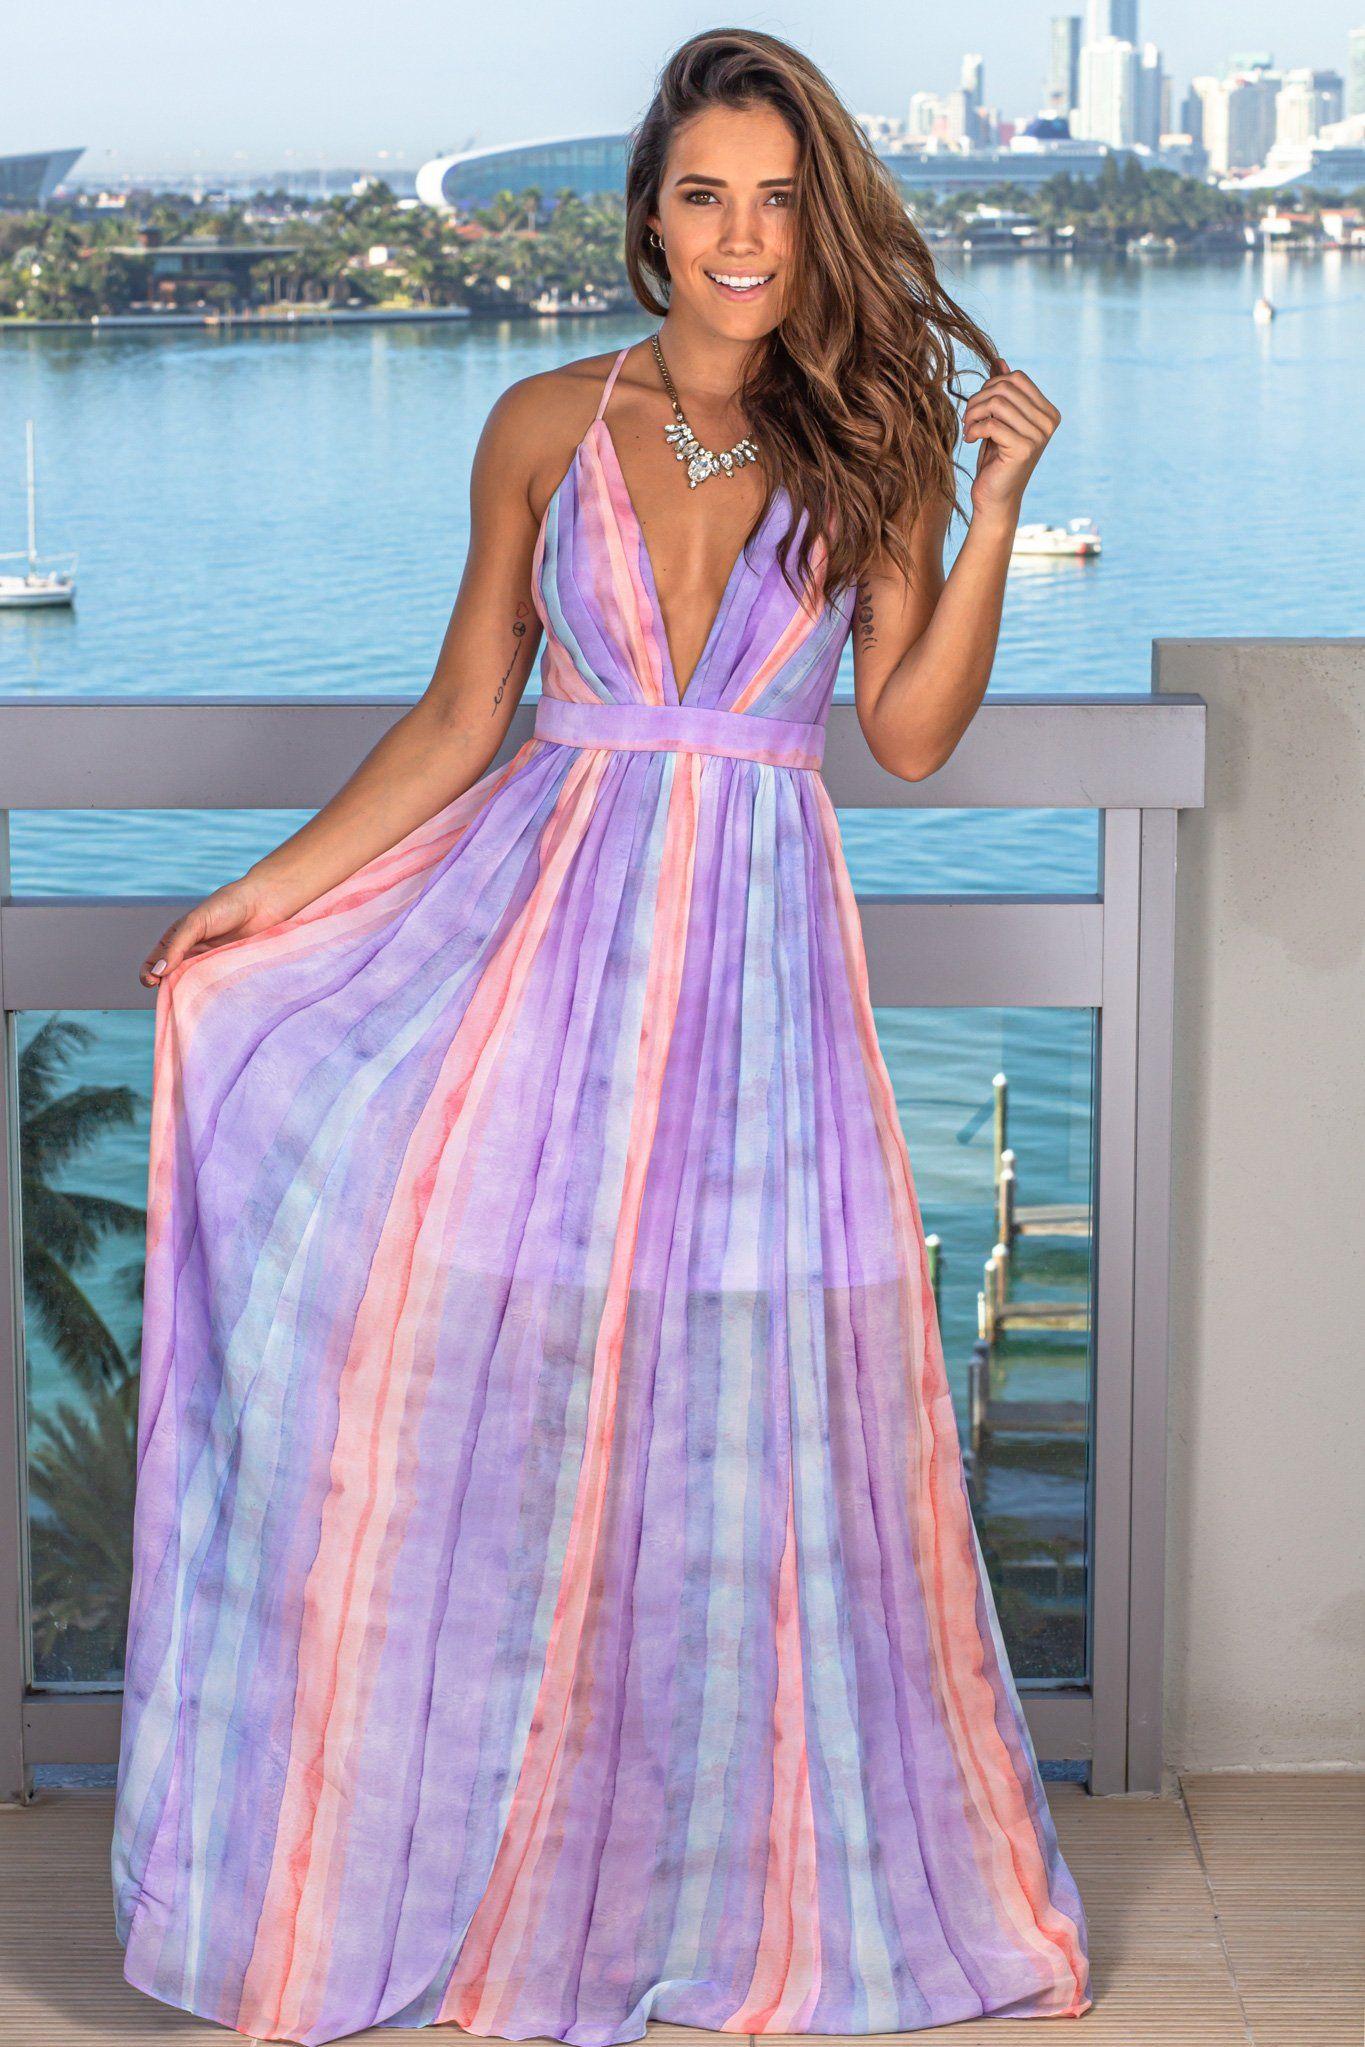 Lilac Rainbow Maxi Dress Maxi Dresses Saved By The Dress Maxi Dress Dresses Saved By The Dress [ 2047 x 1365 Pixel ]